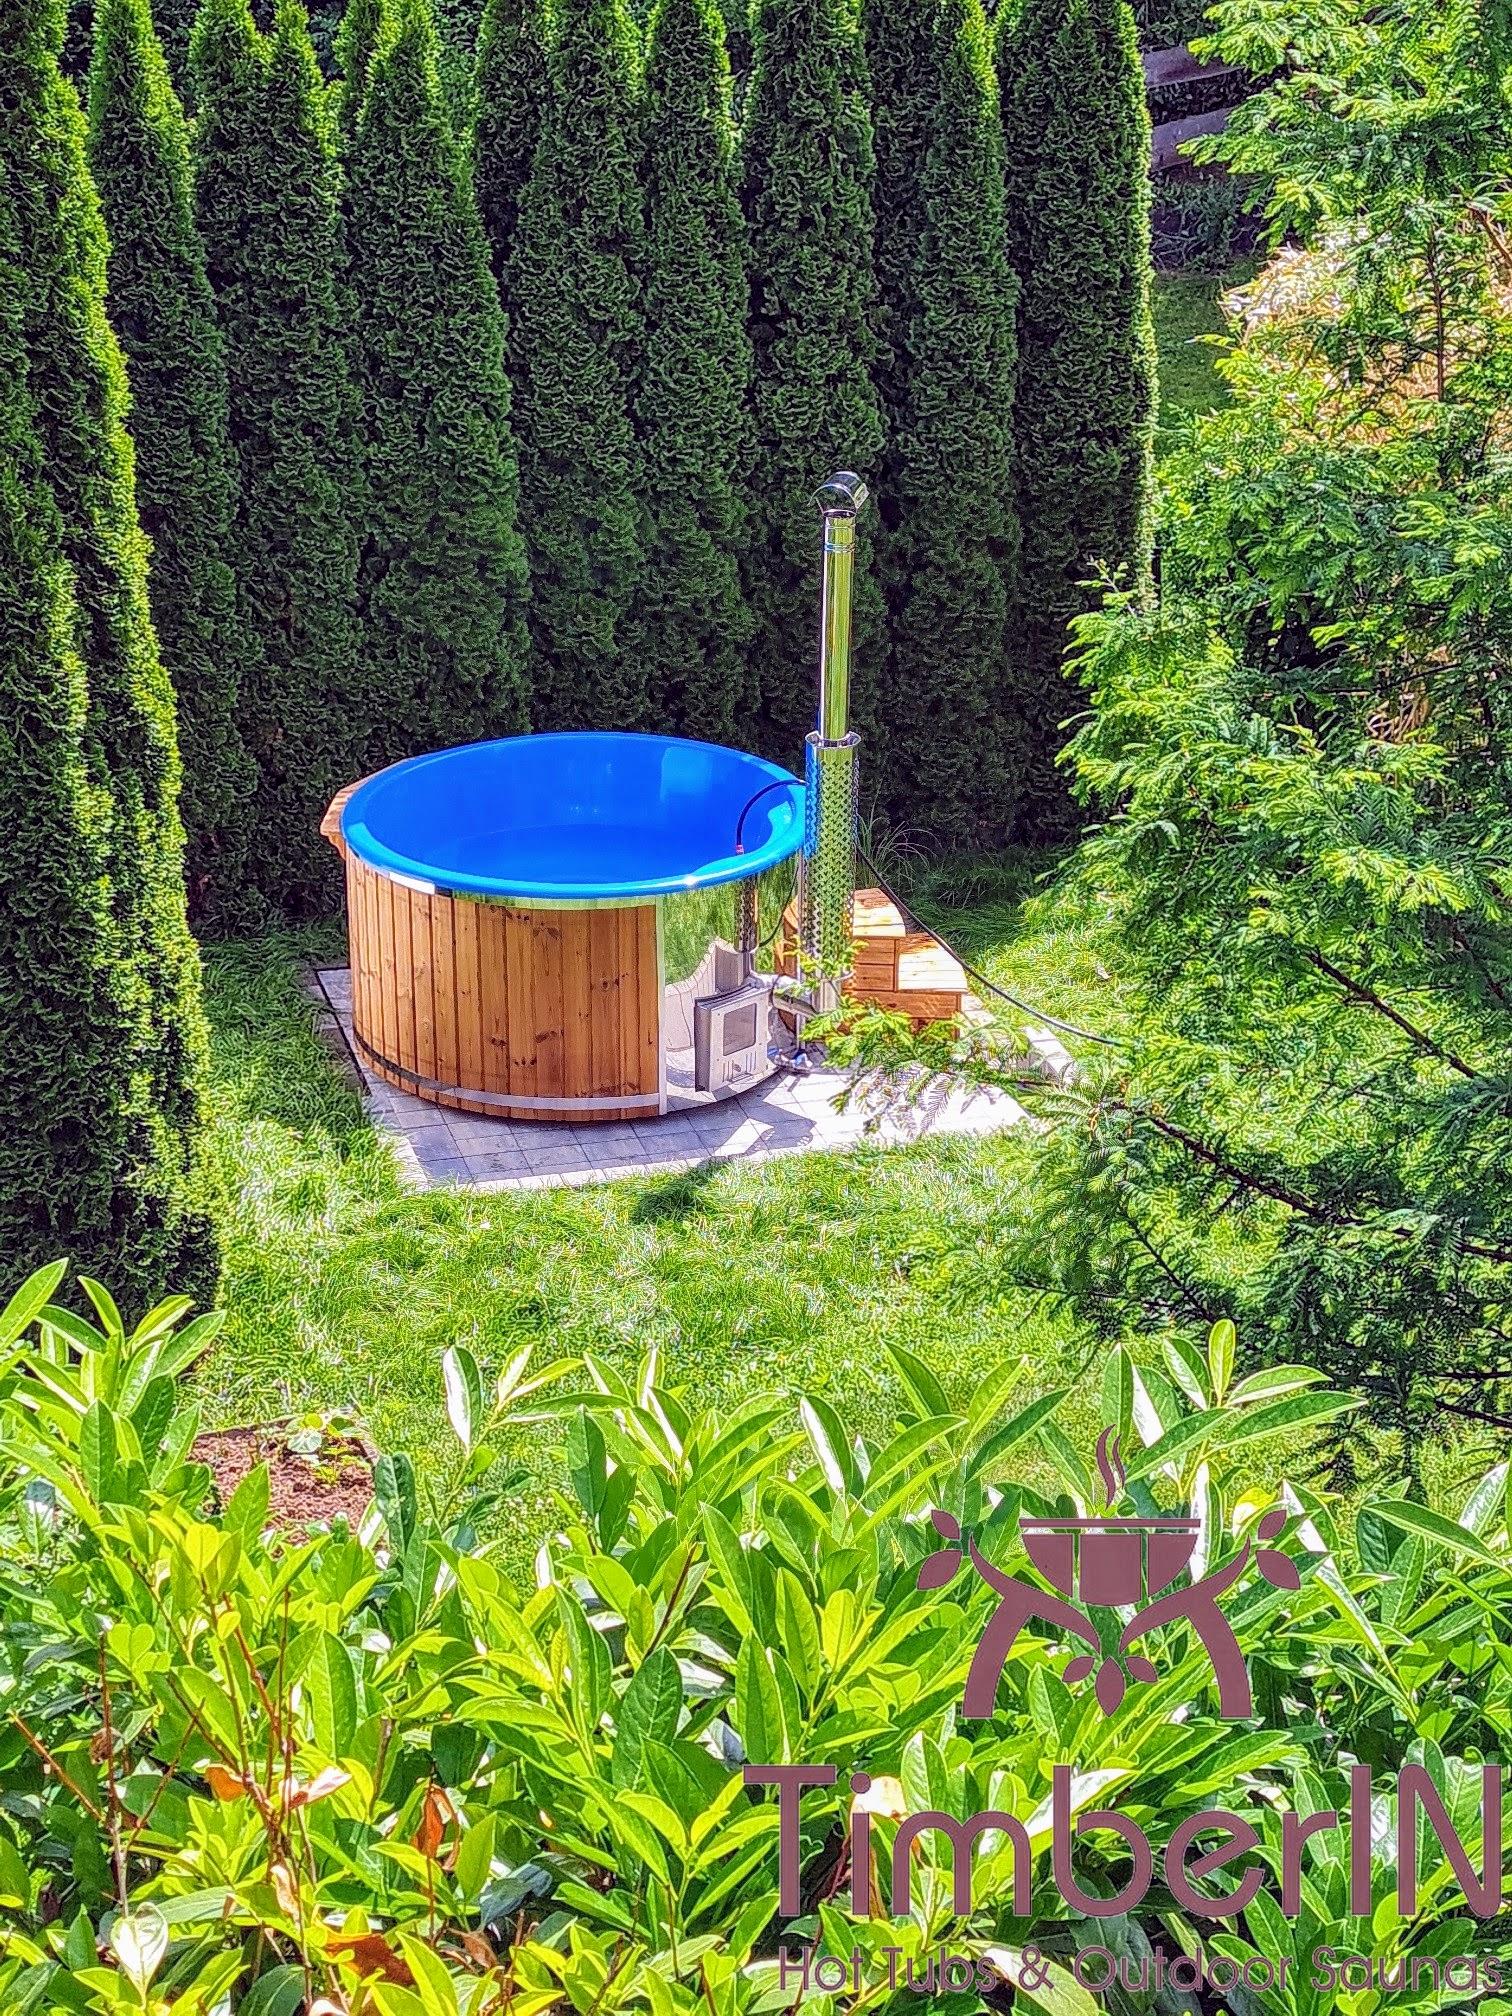 Badetonne Badebottich Hot Tube GFK mit Whirlpoolfunktion 4 7